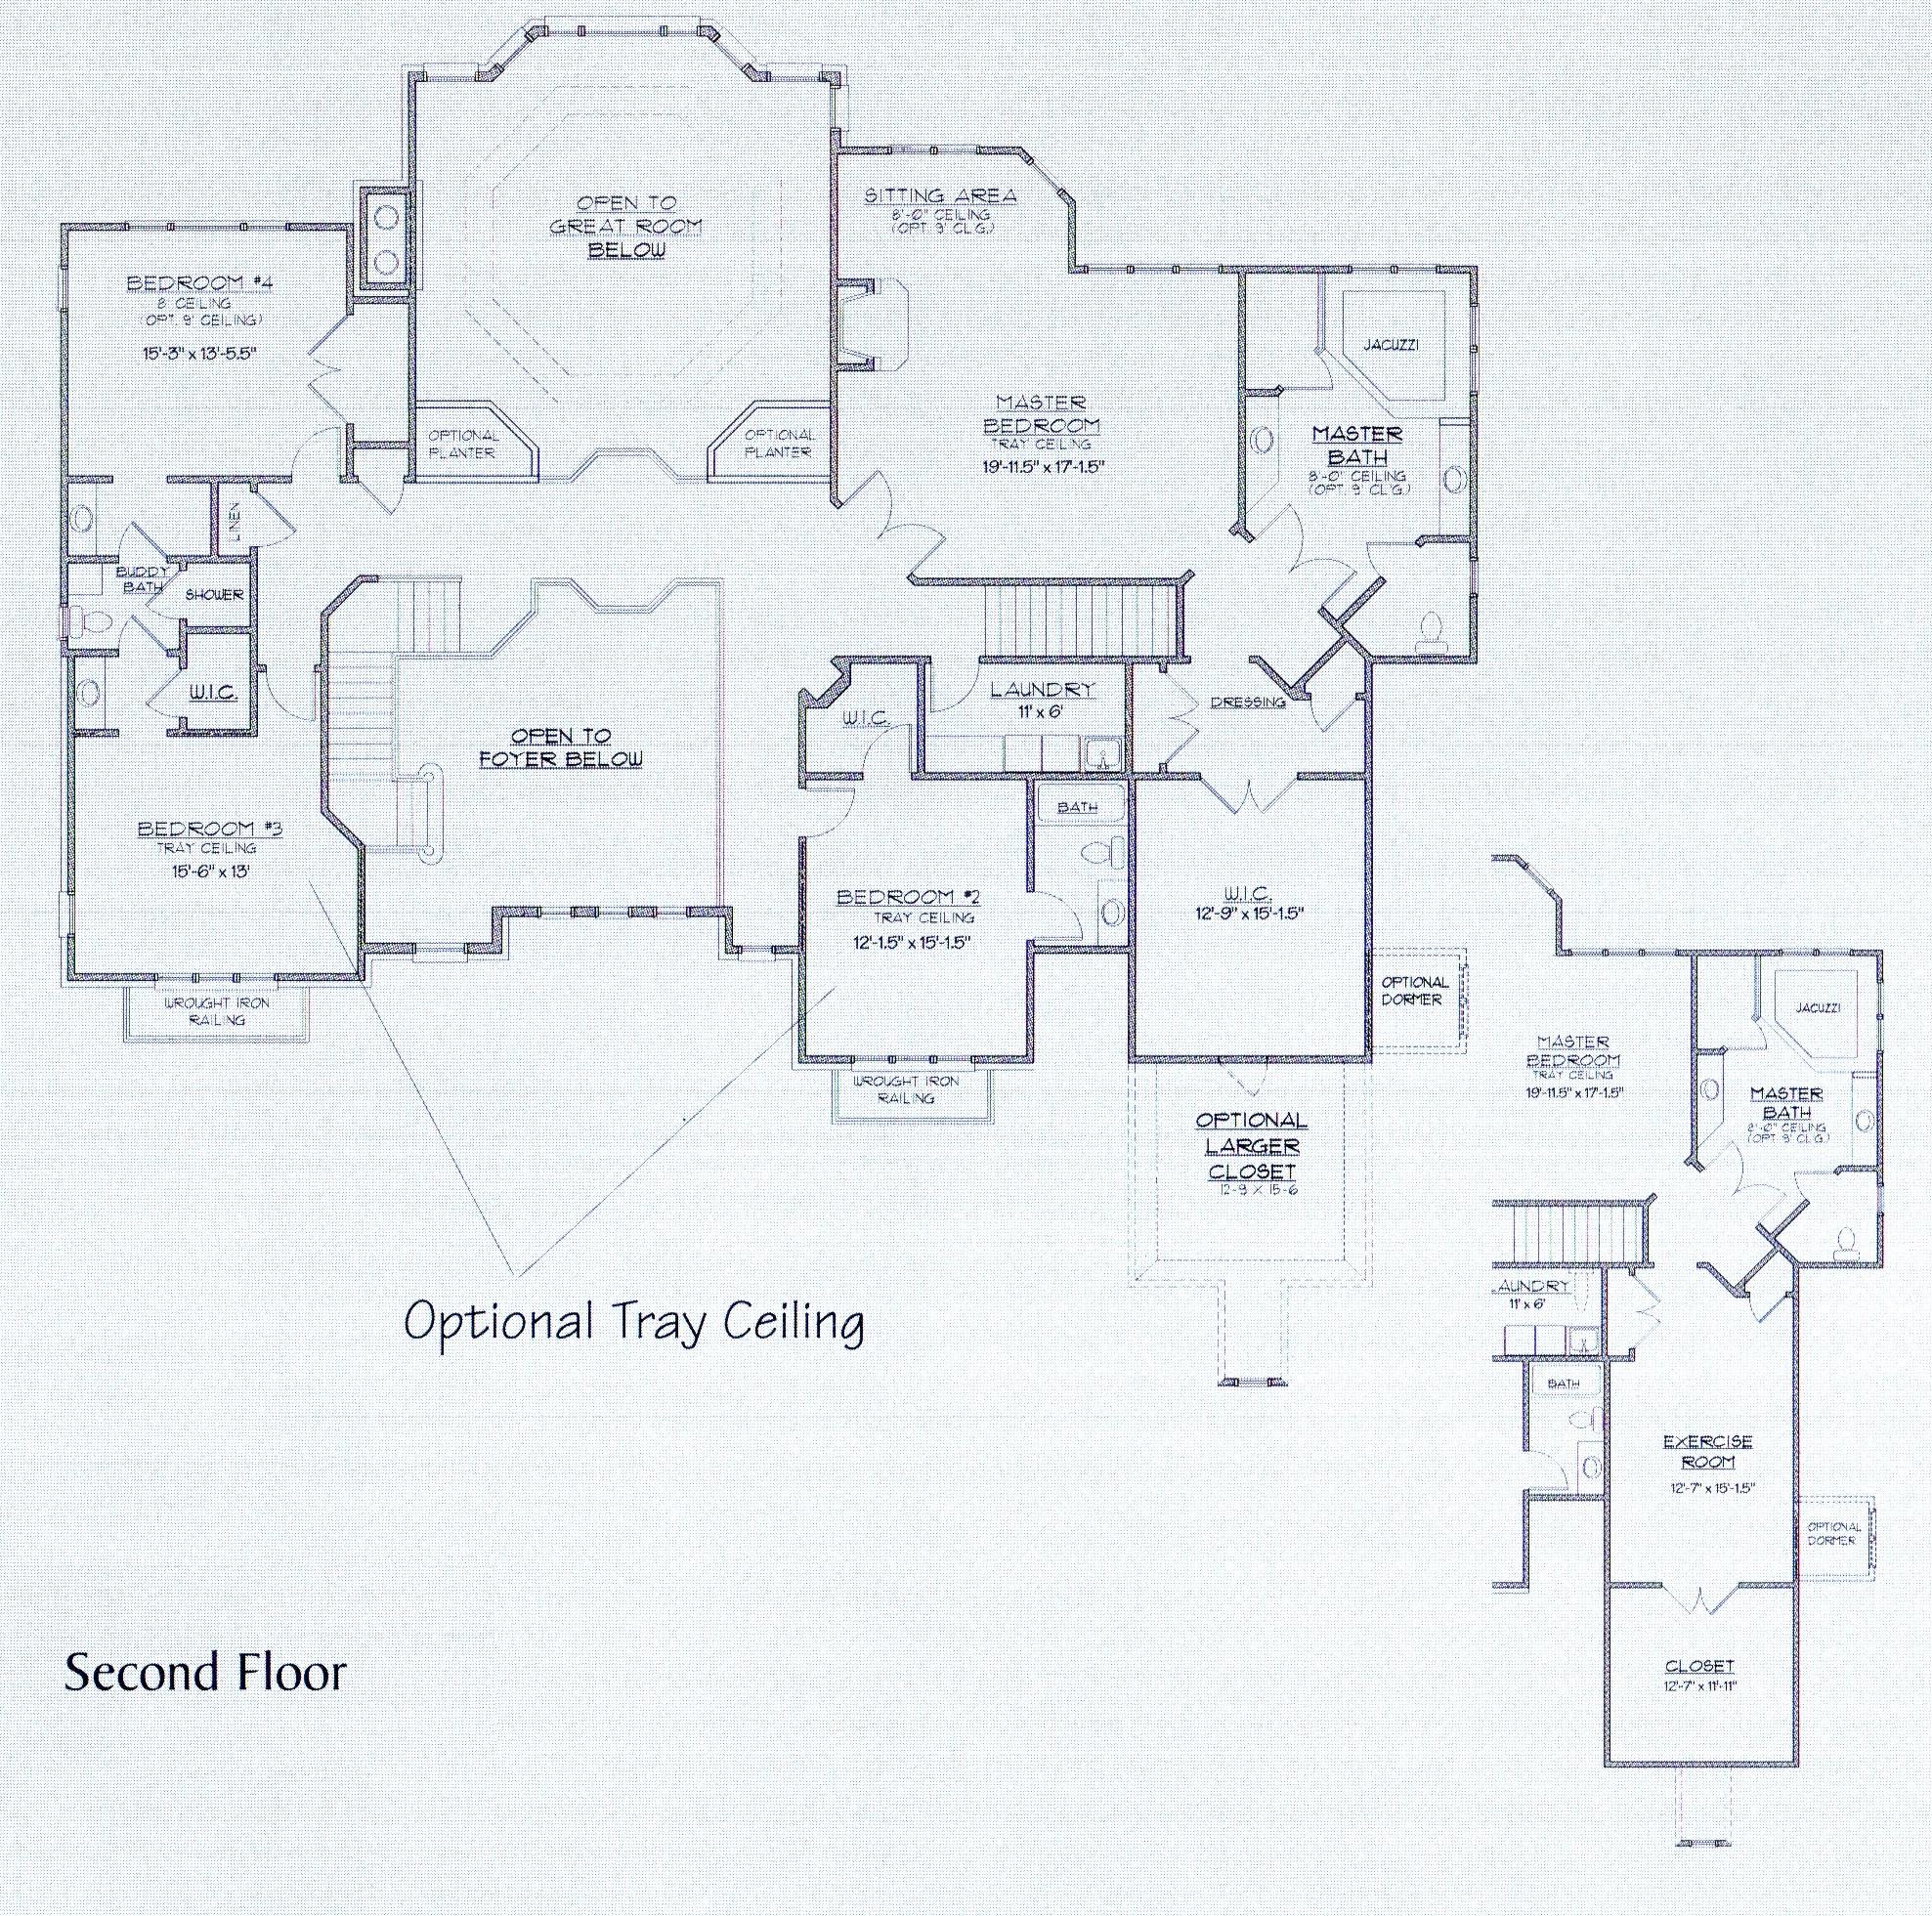 Larch Second Floor